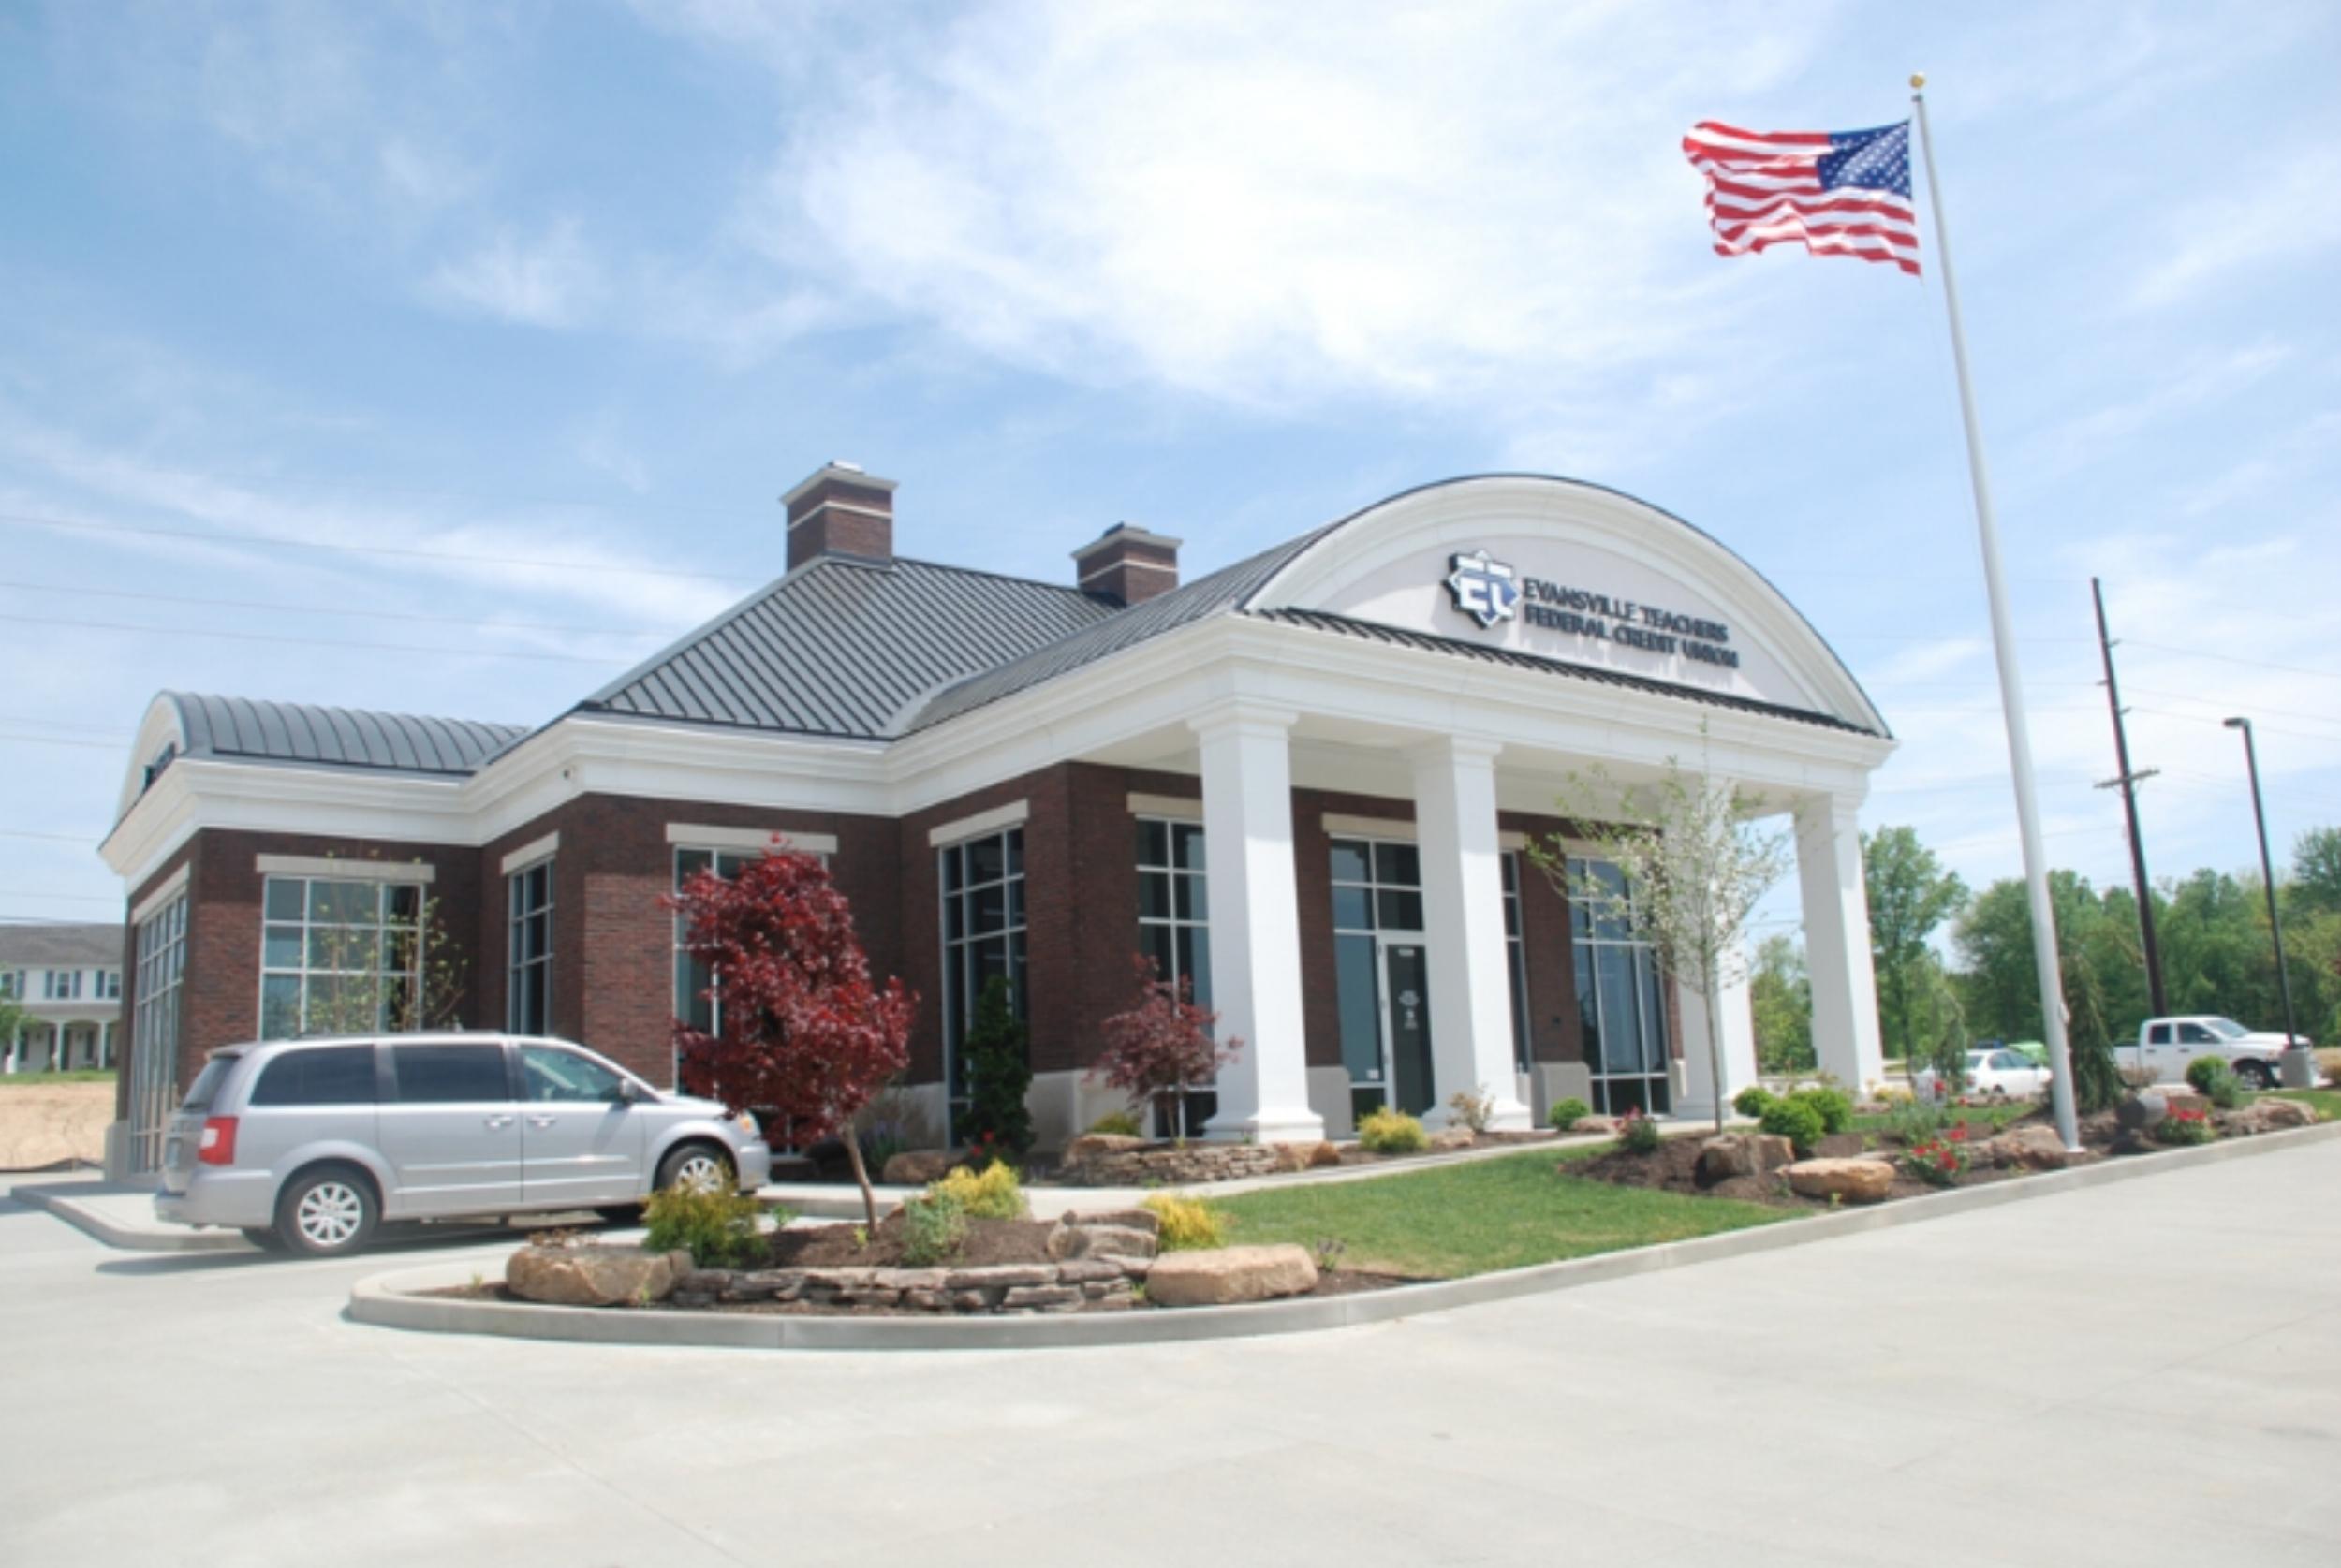 Evansville Teachers  Credit Union